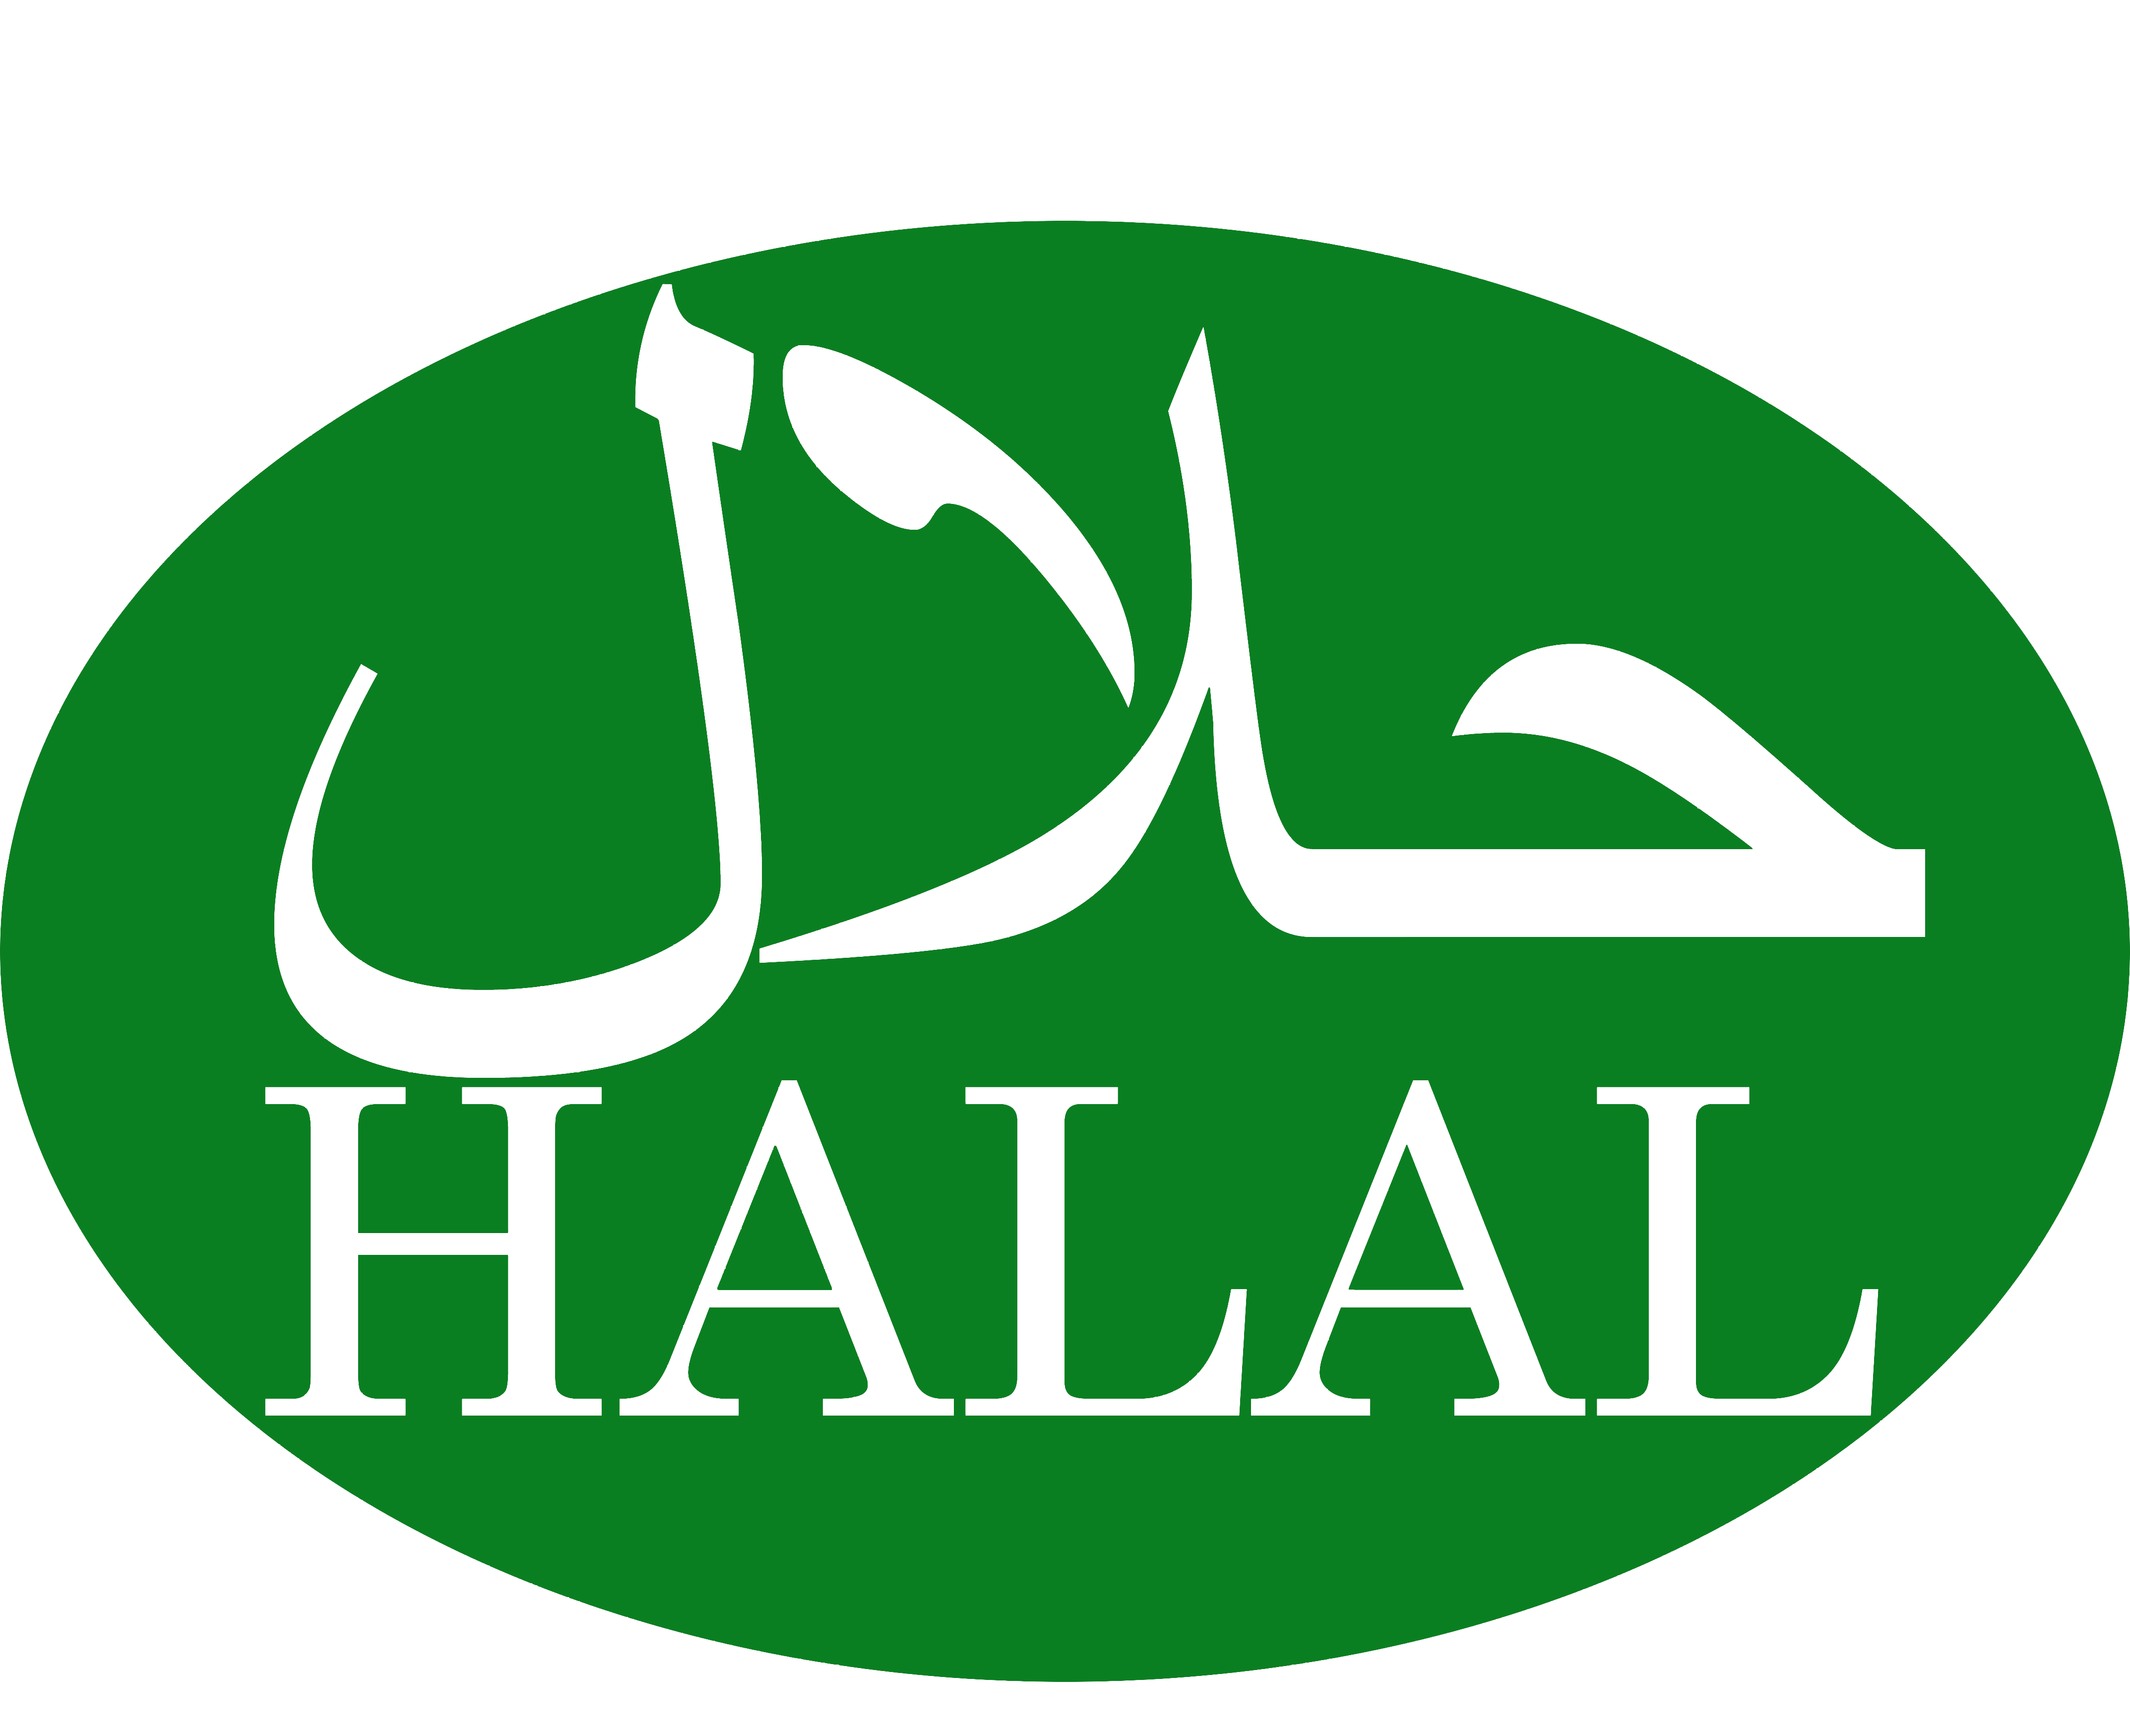 Png Logo Halal Free Transparent Png Logos